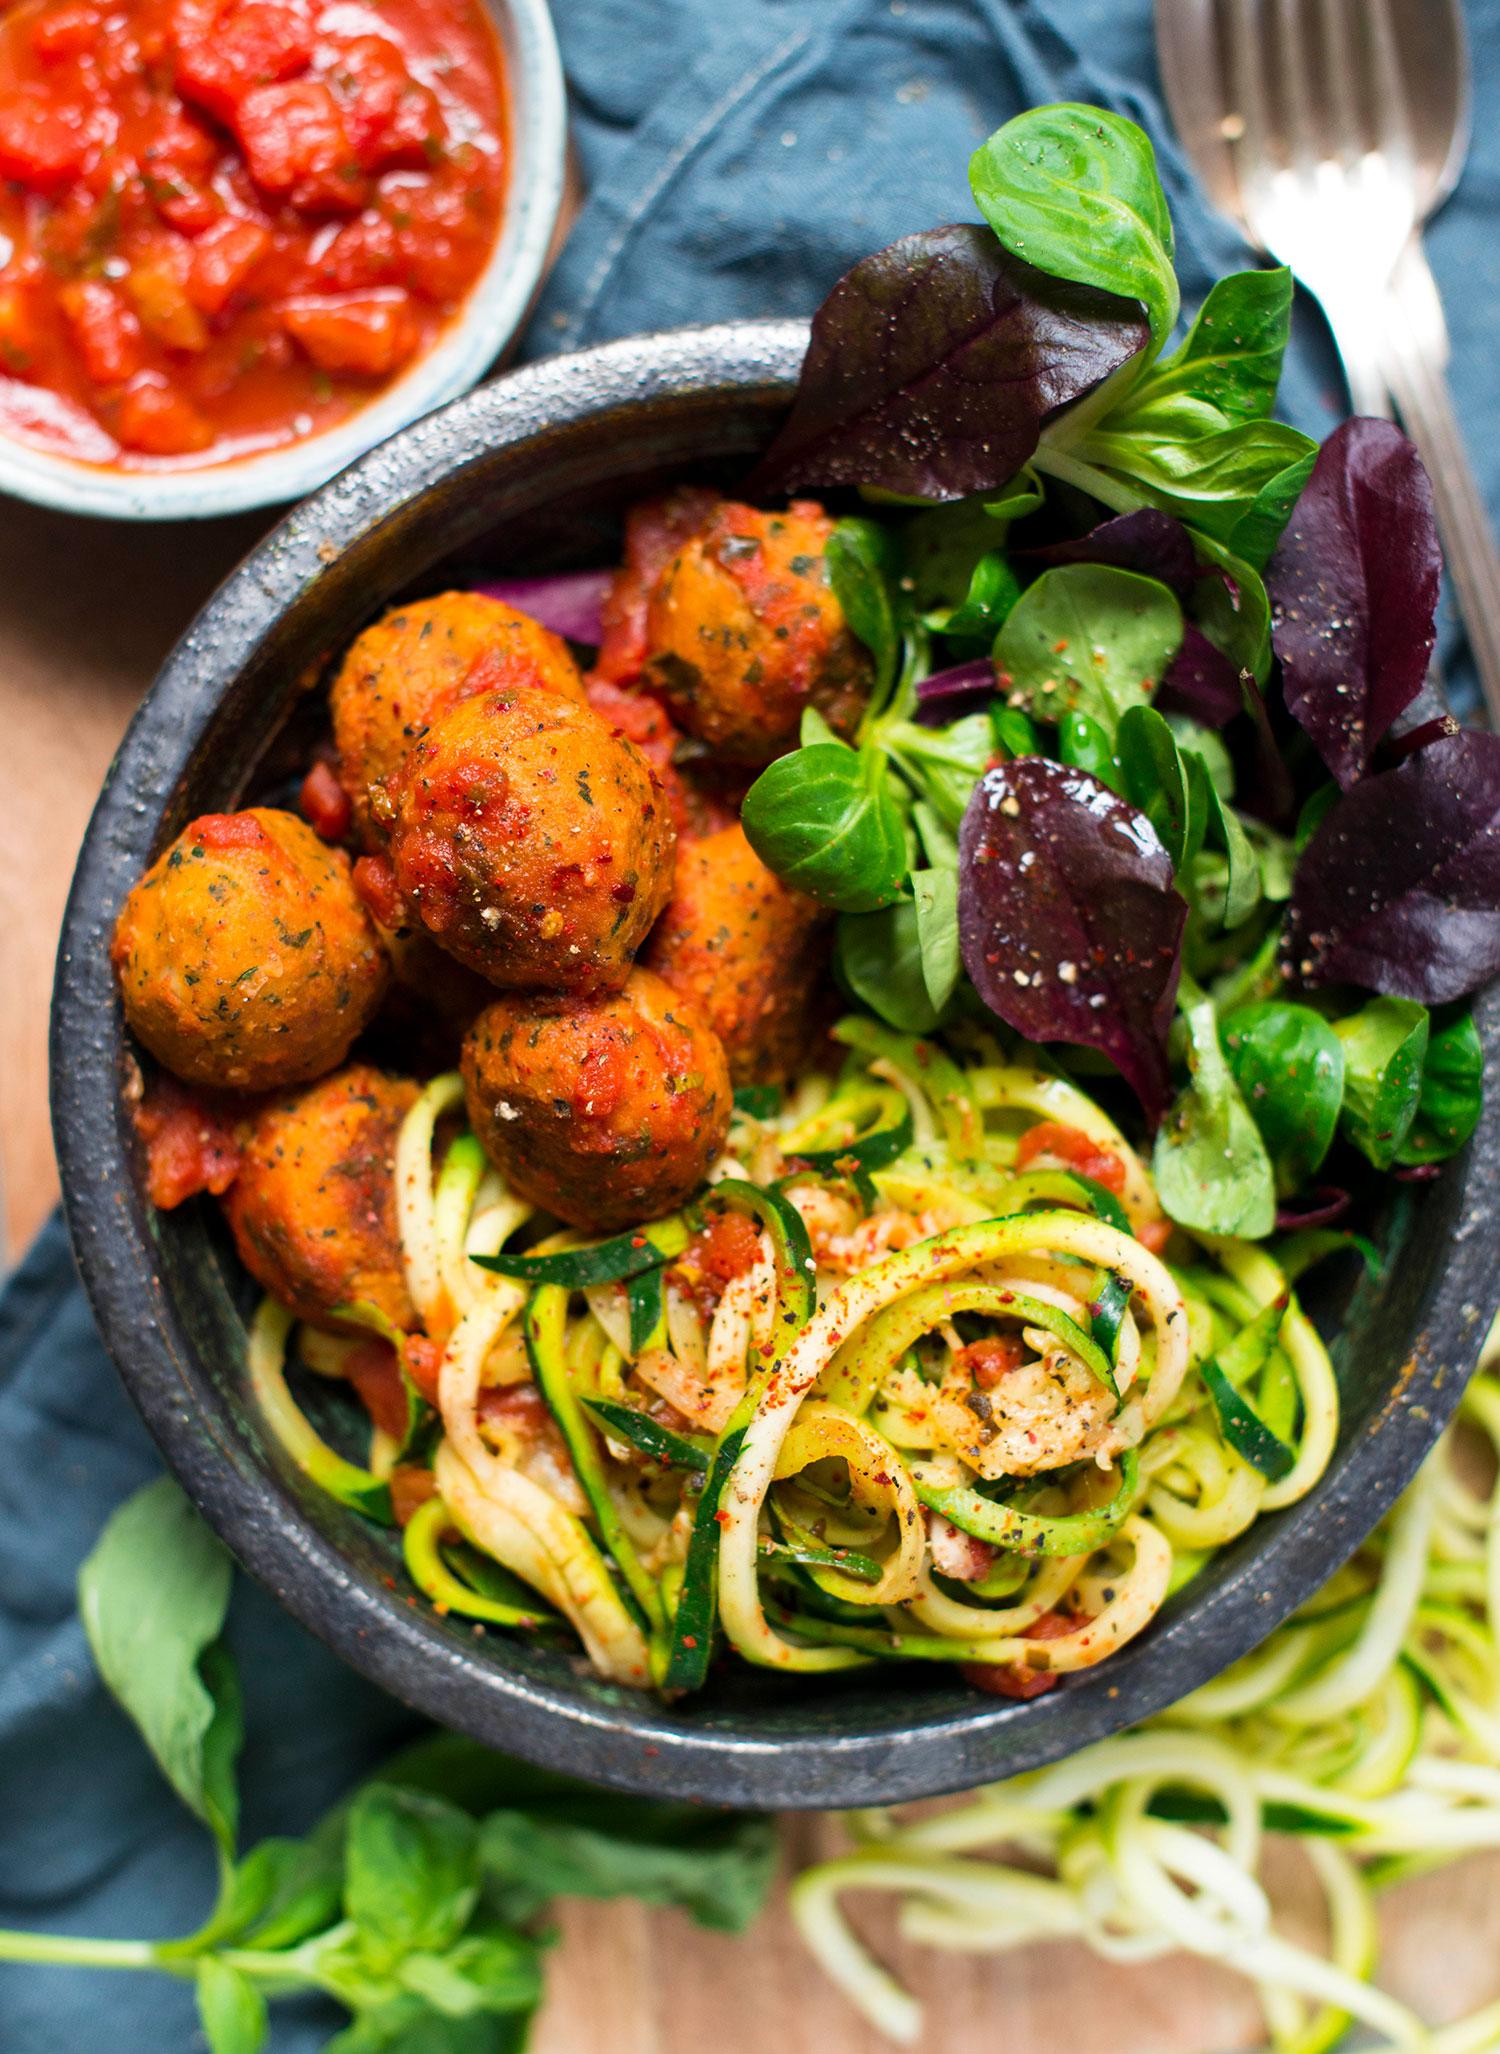 Courgetti-vegan-meat-balls-Florette-Lea-Lou-3